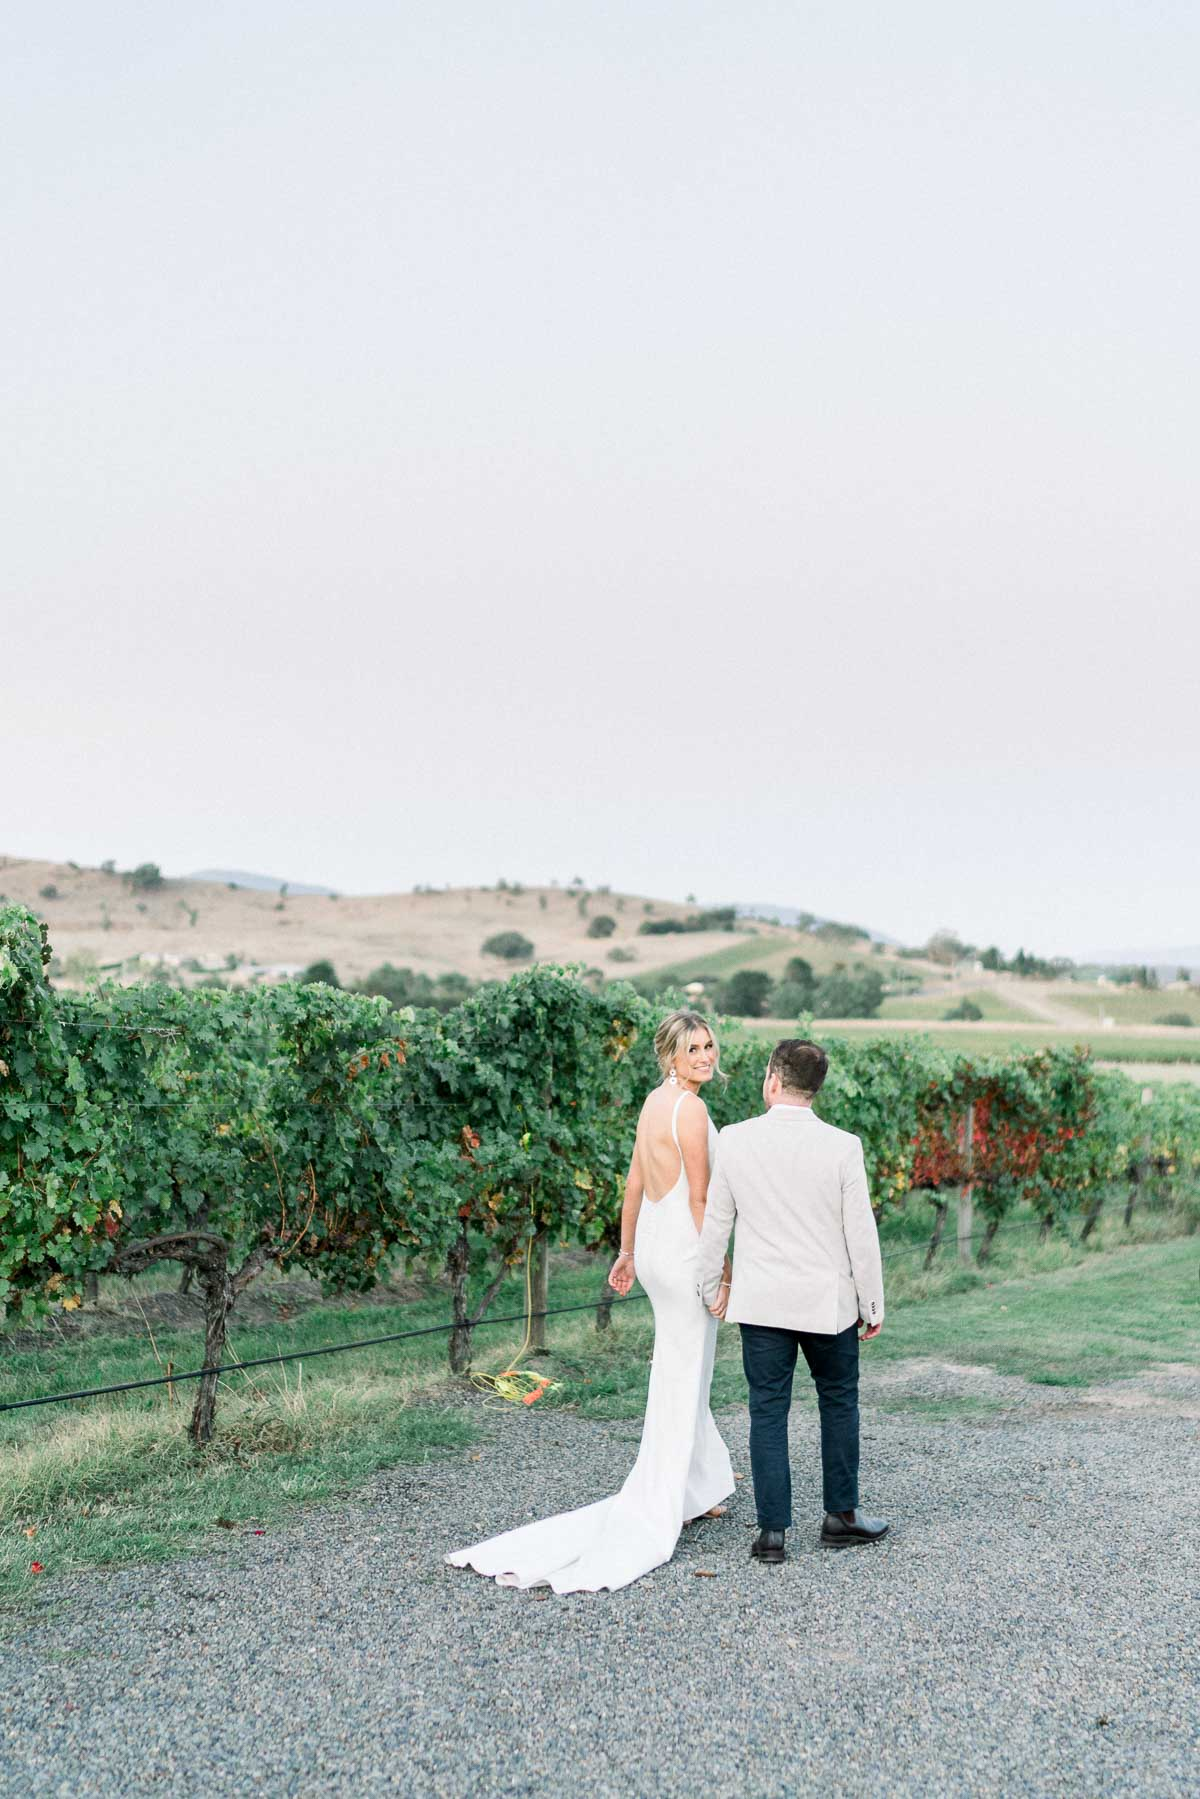 rustic-yarra-valley-wedding-venue-acacia-ridge-georgia-james-08475.jpg